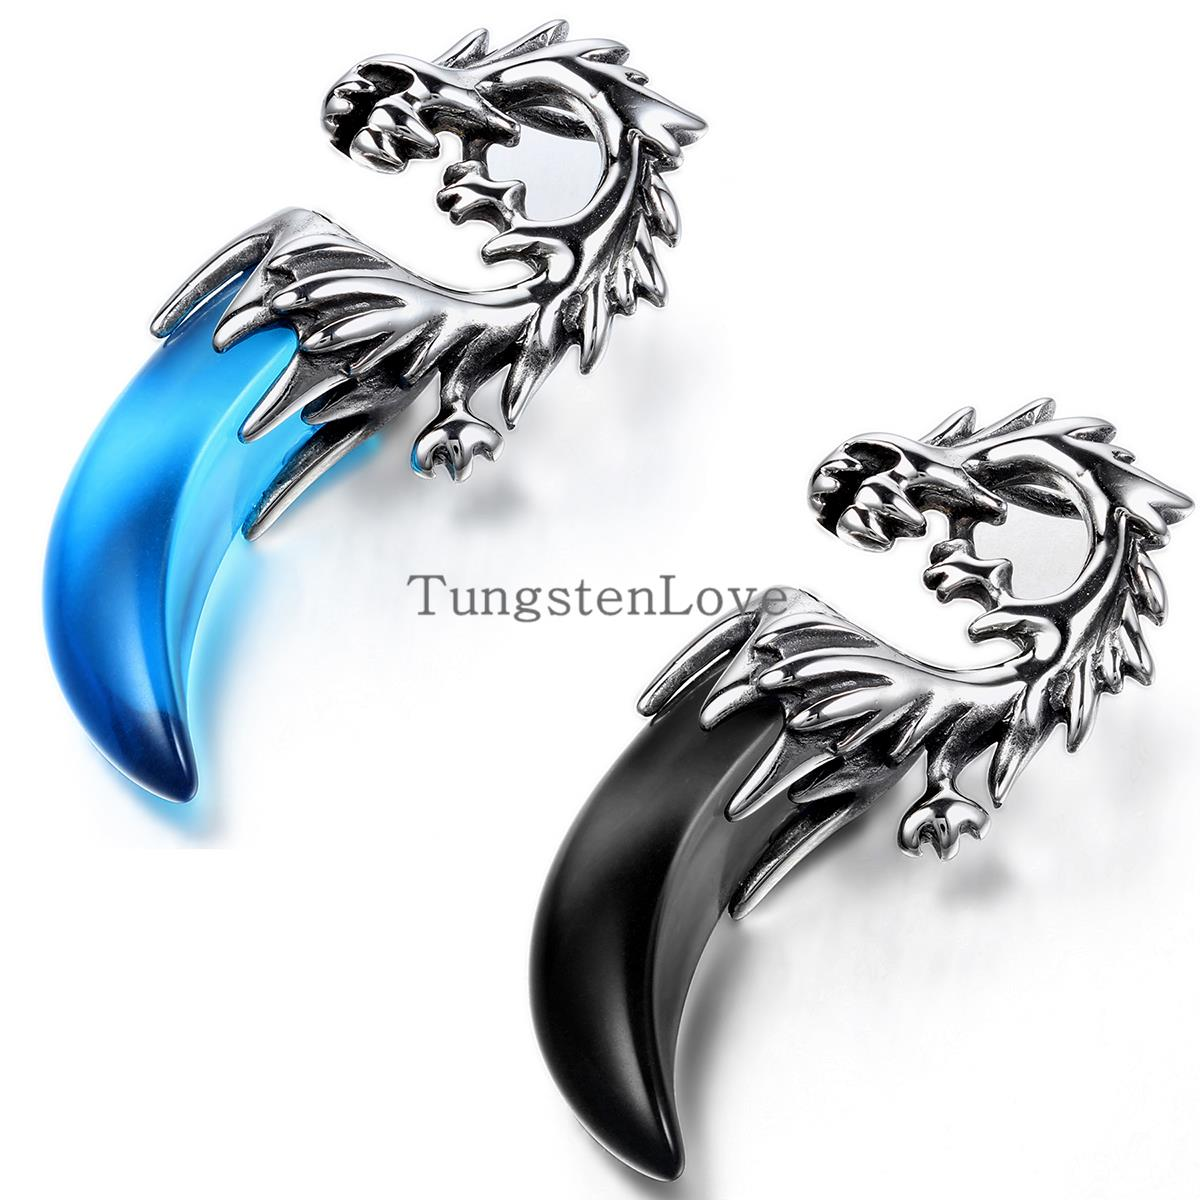 Hommes 3D Dragon Colliers LAPIS LAZULI Gemstone dent Tribal Pendentif Chaîne